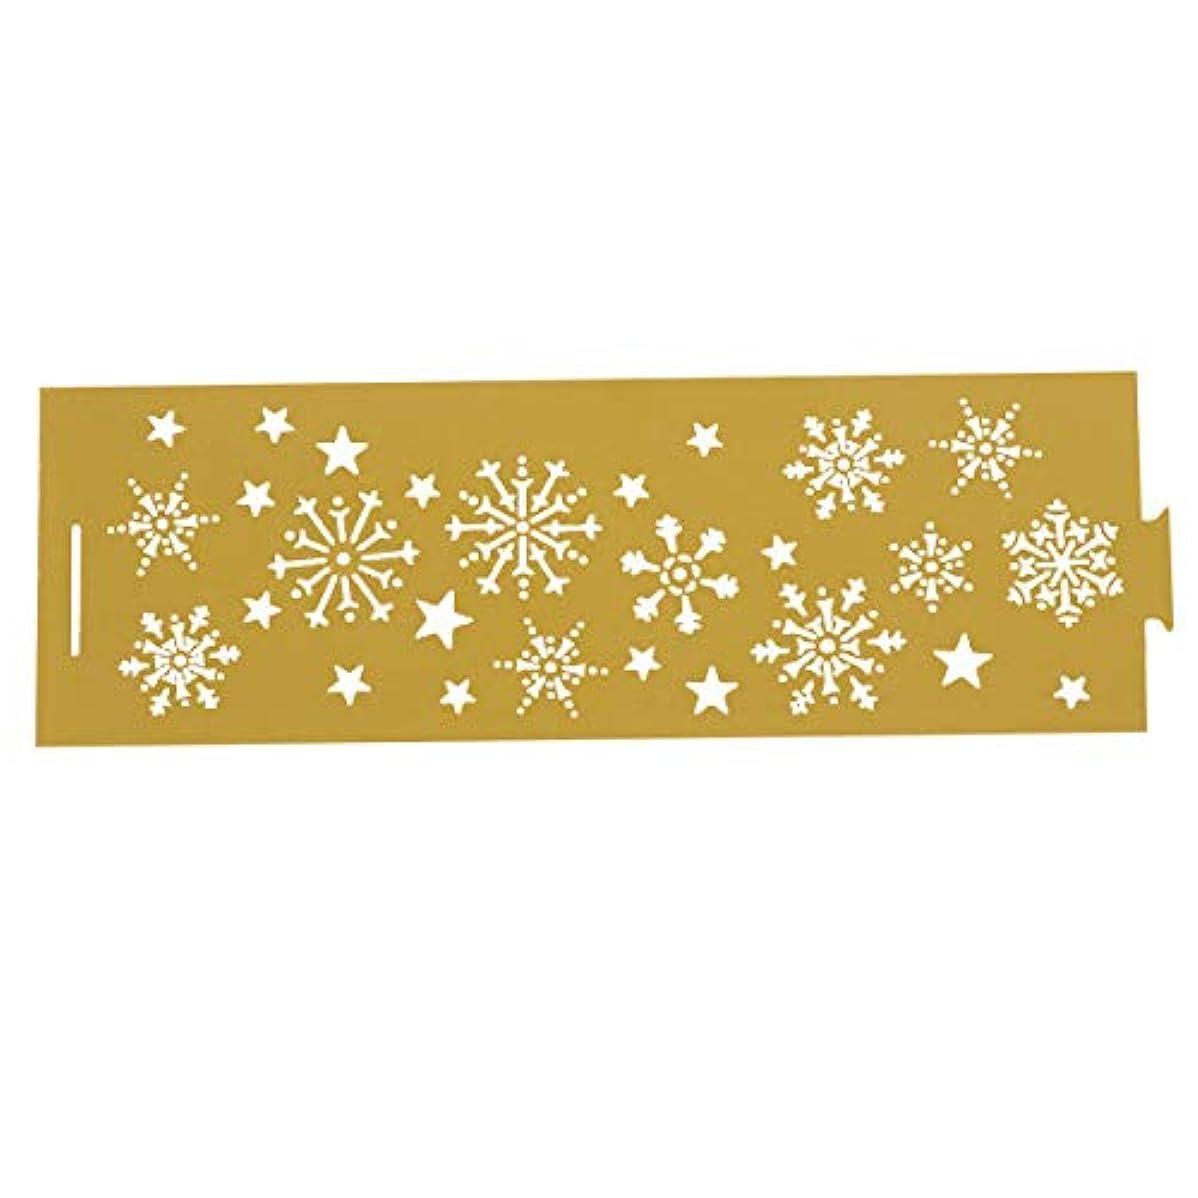 BESTONZON 50ピースled電子キャンドルラッパーライト中空キャンドルシェードカバーペーパーラッパーペーパーキャンドル装飾(ゴールデン)